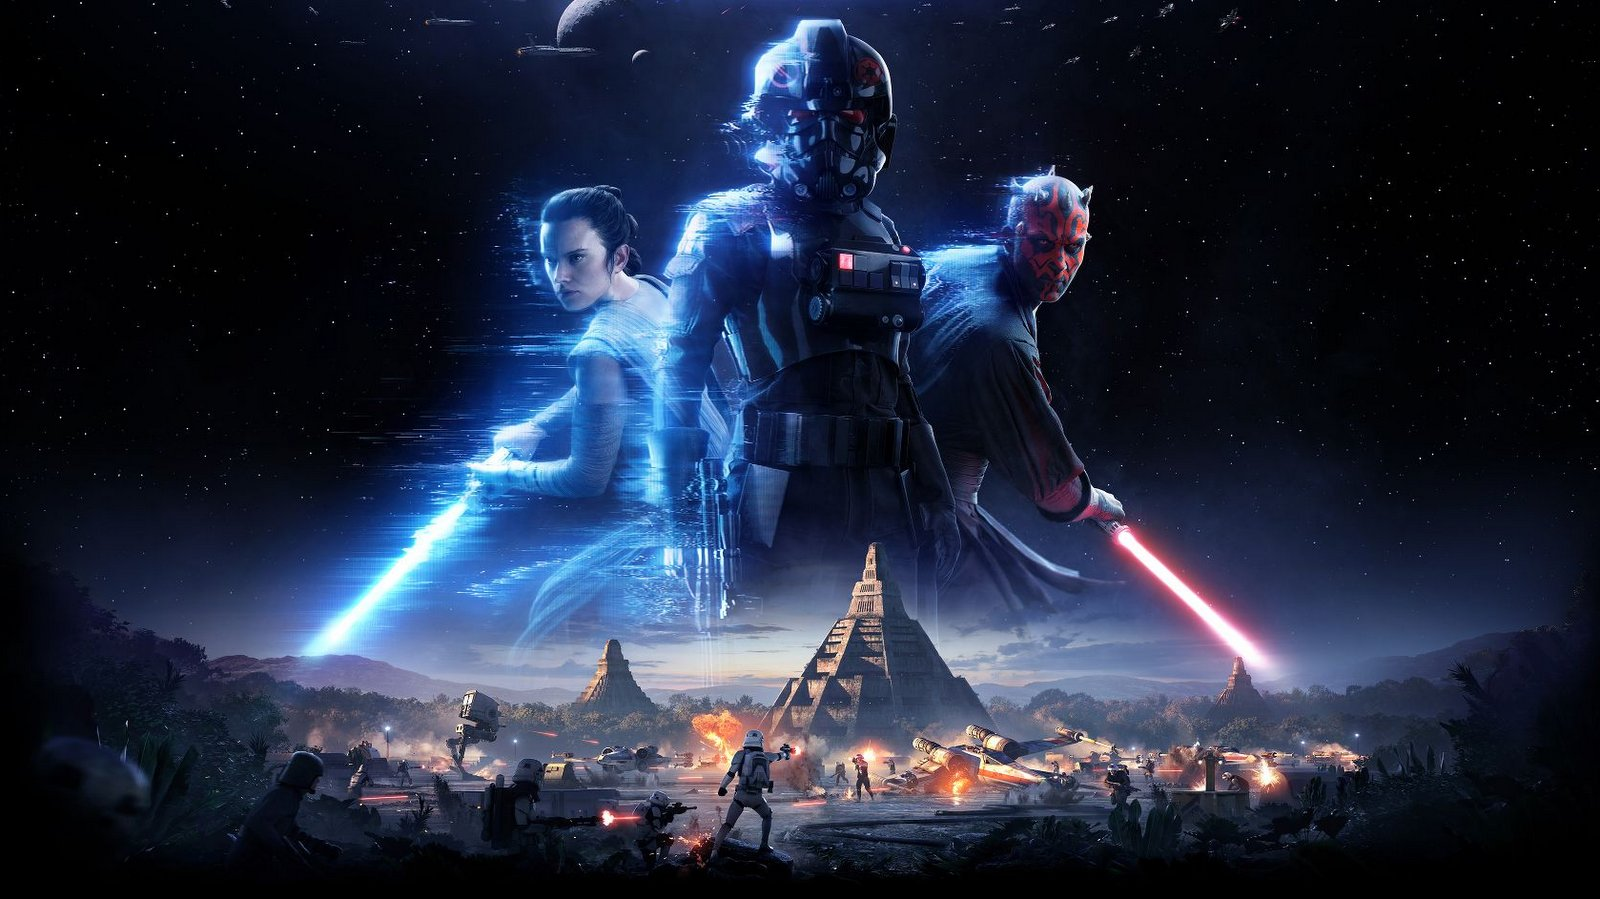 star-wars-battlefront-2-dlc-last-jedi-season.jpg